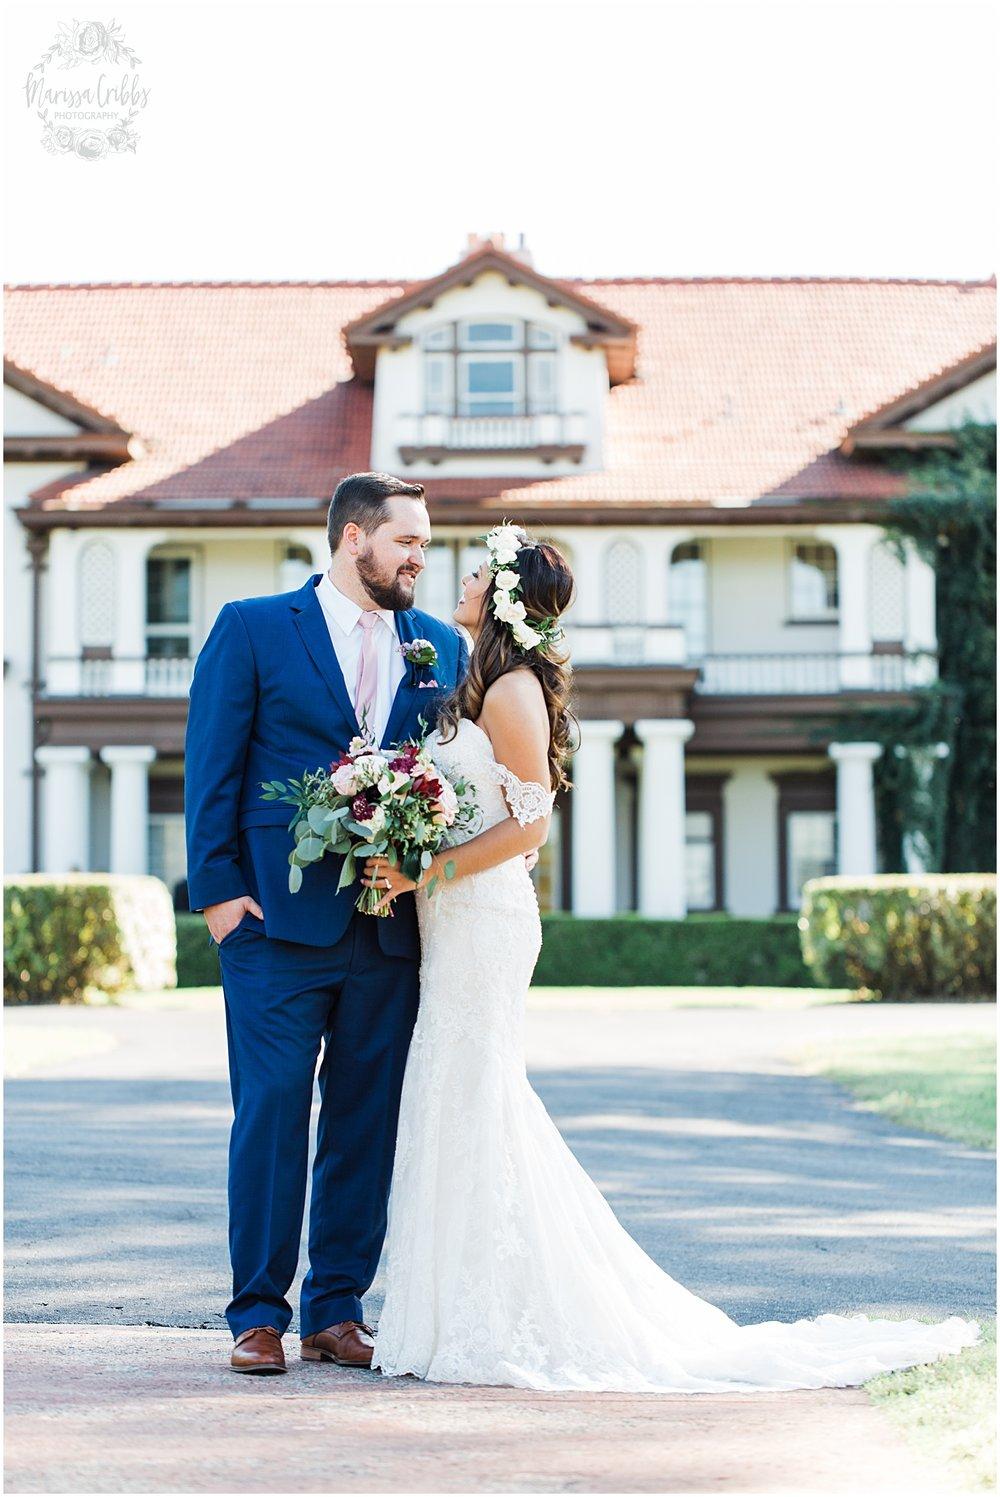 2017 wedding recap | MARISSA CRIBBS PHOTOGRAPHY_4102.jpg